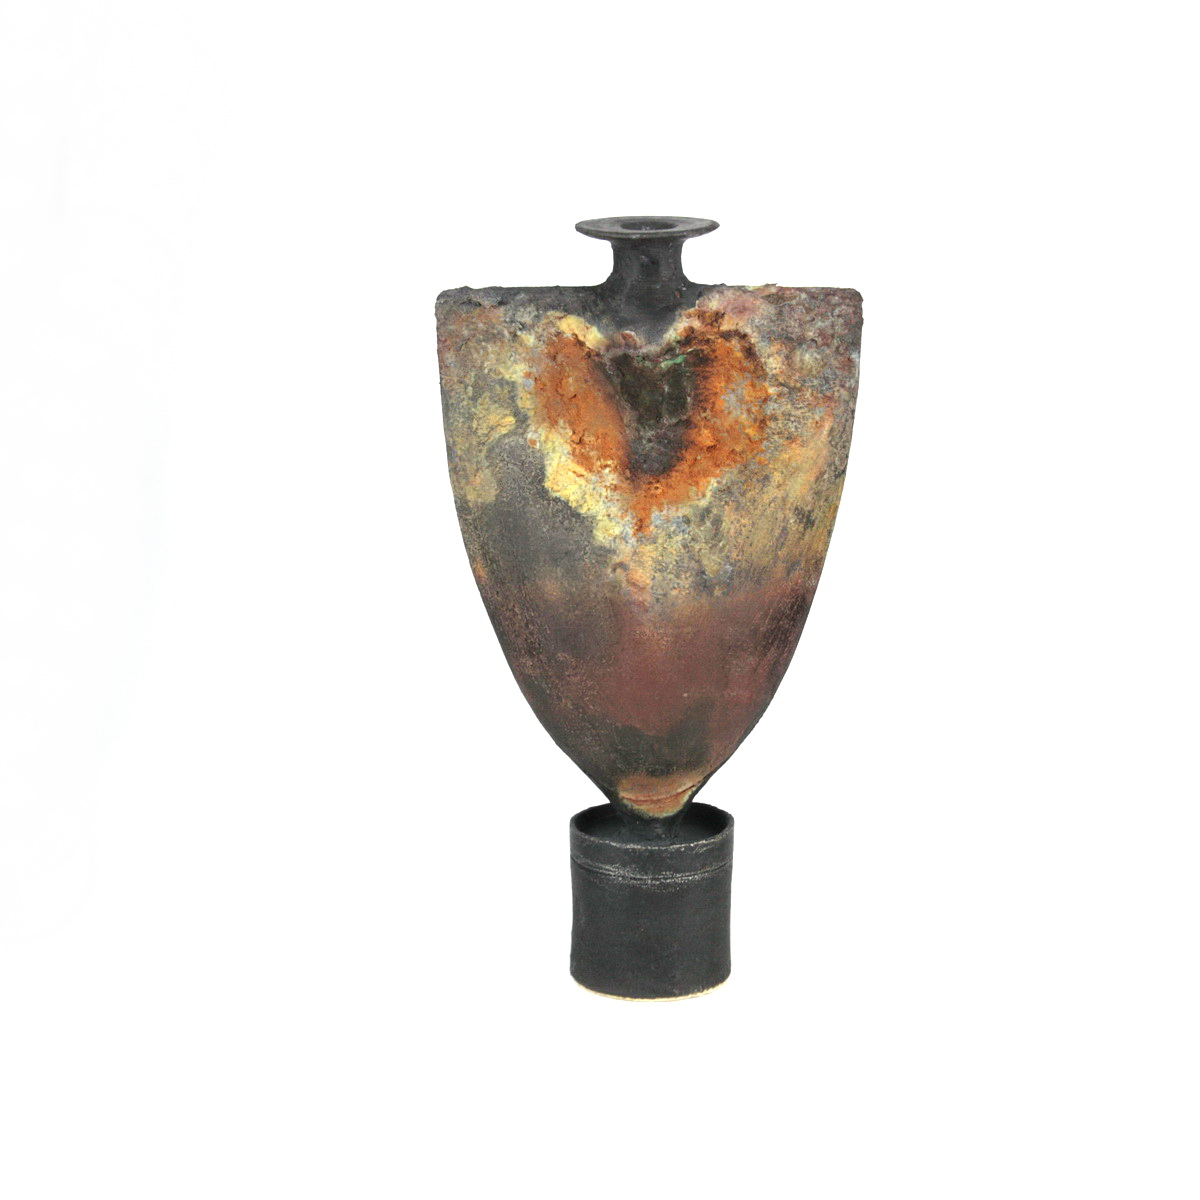 john-bedding-ceramic-pot-c111